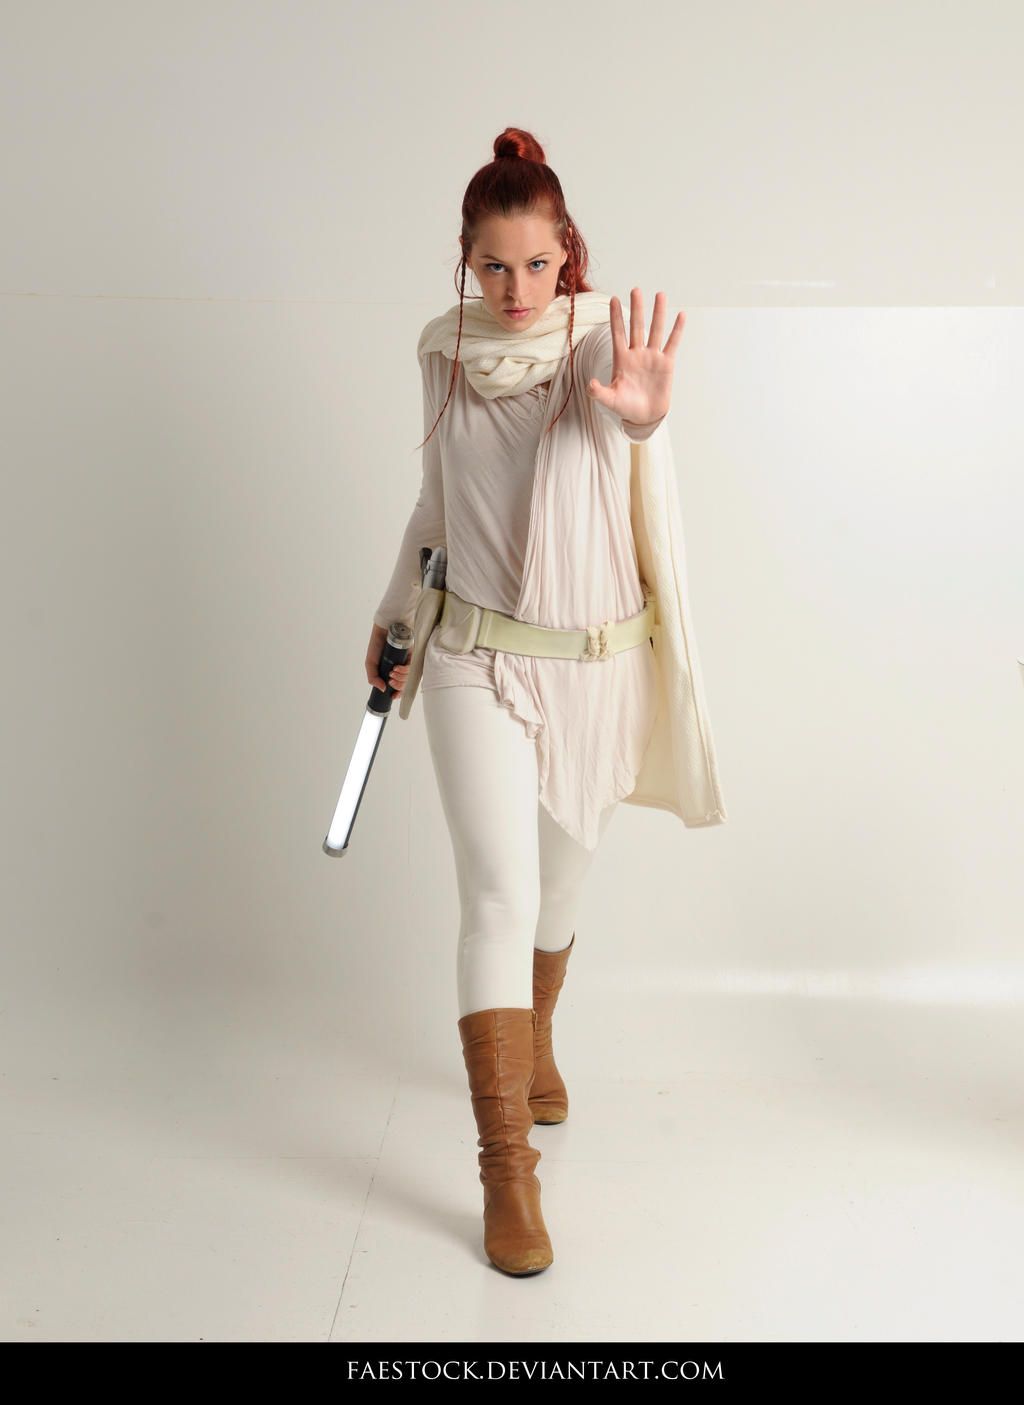 Jedi  - Stock Pose Reference 25